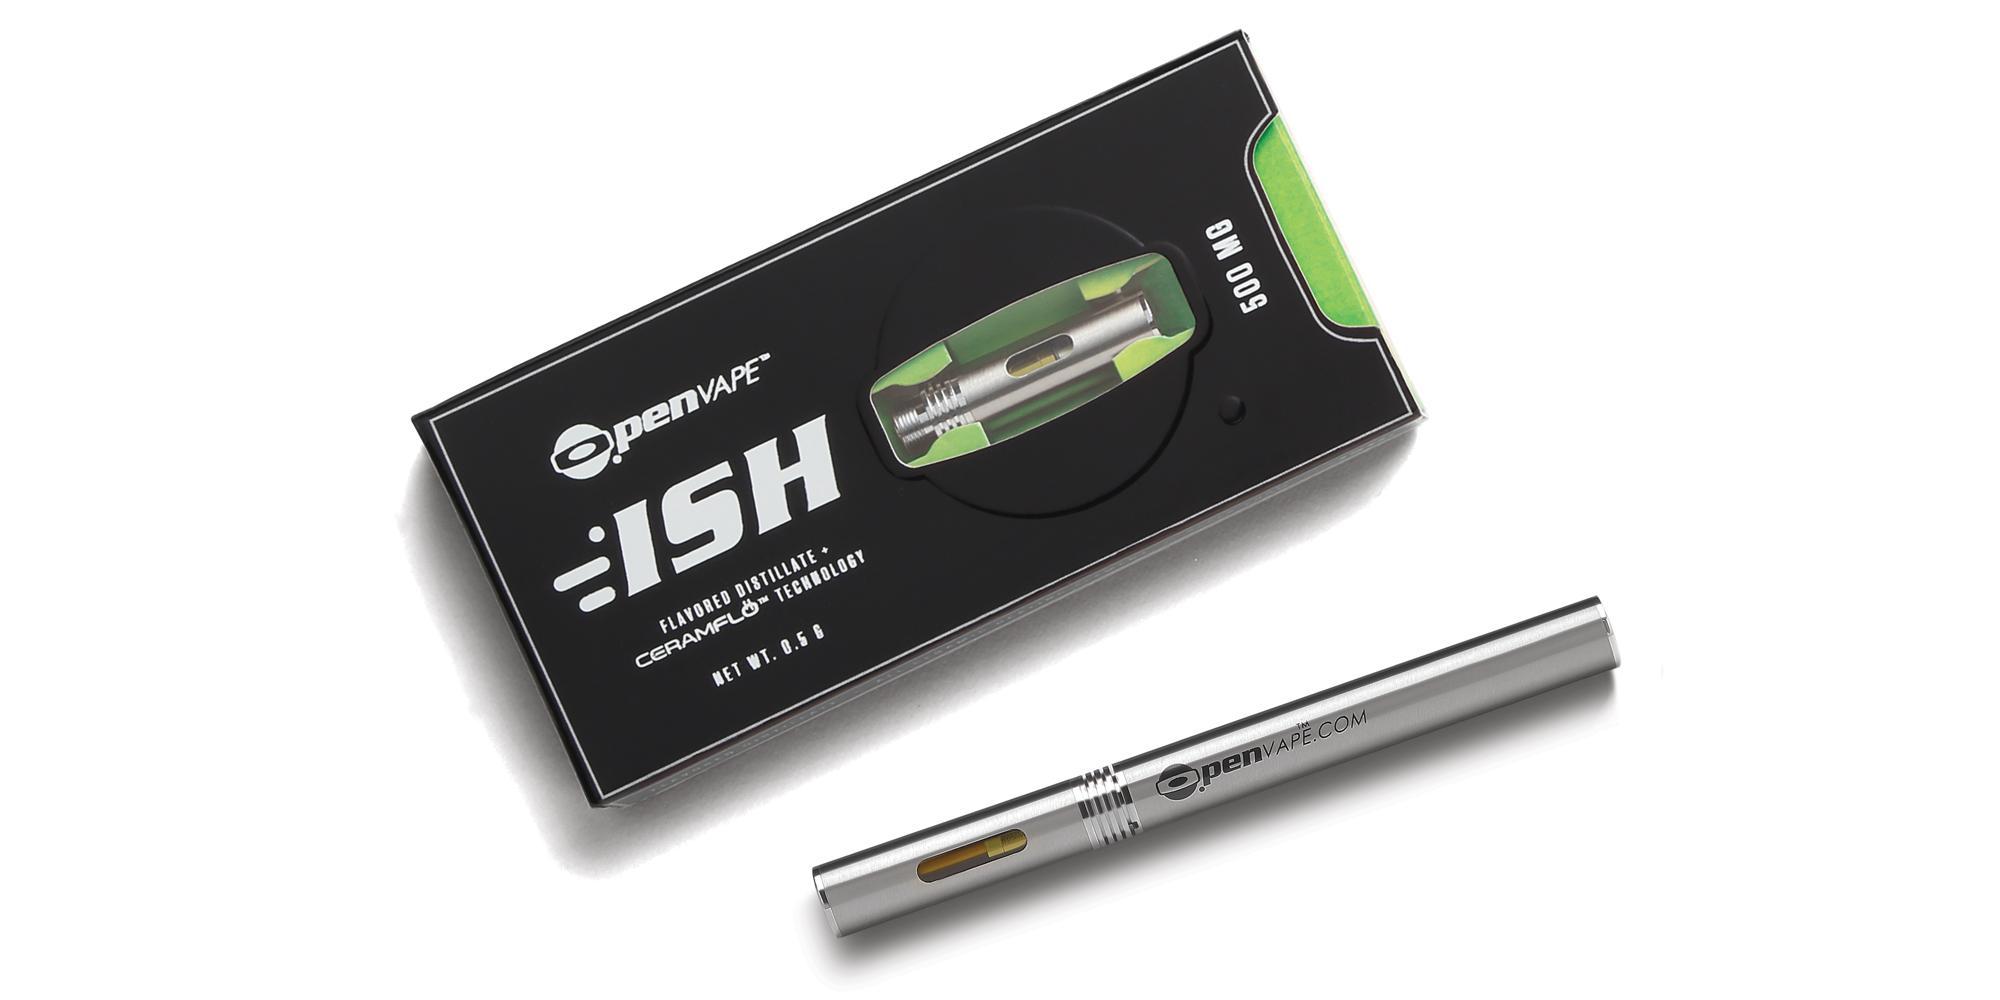 Ish O-Pen Vape Pens